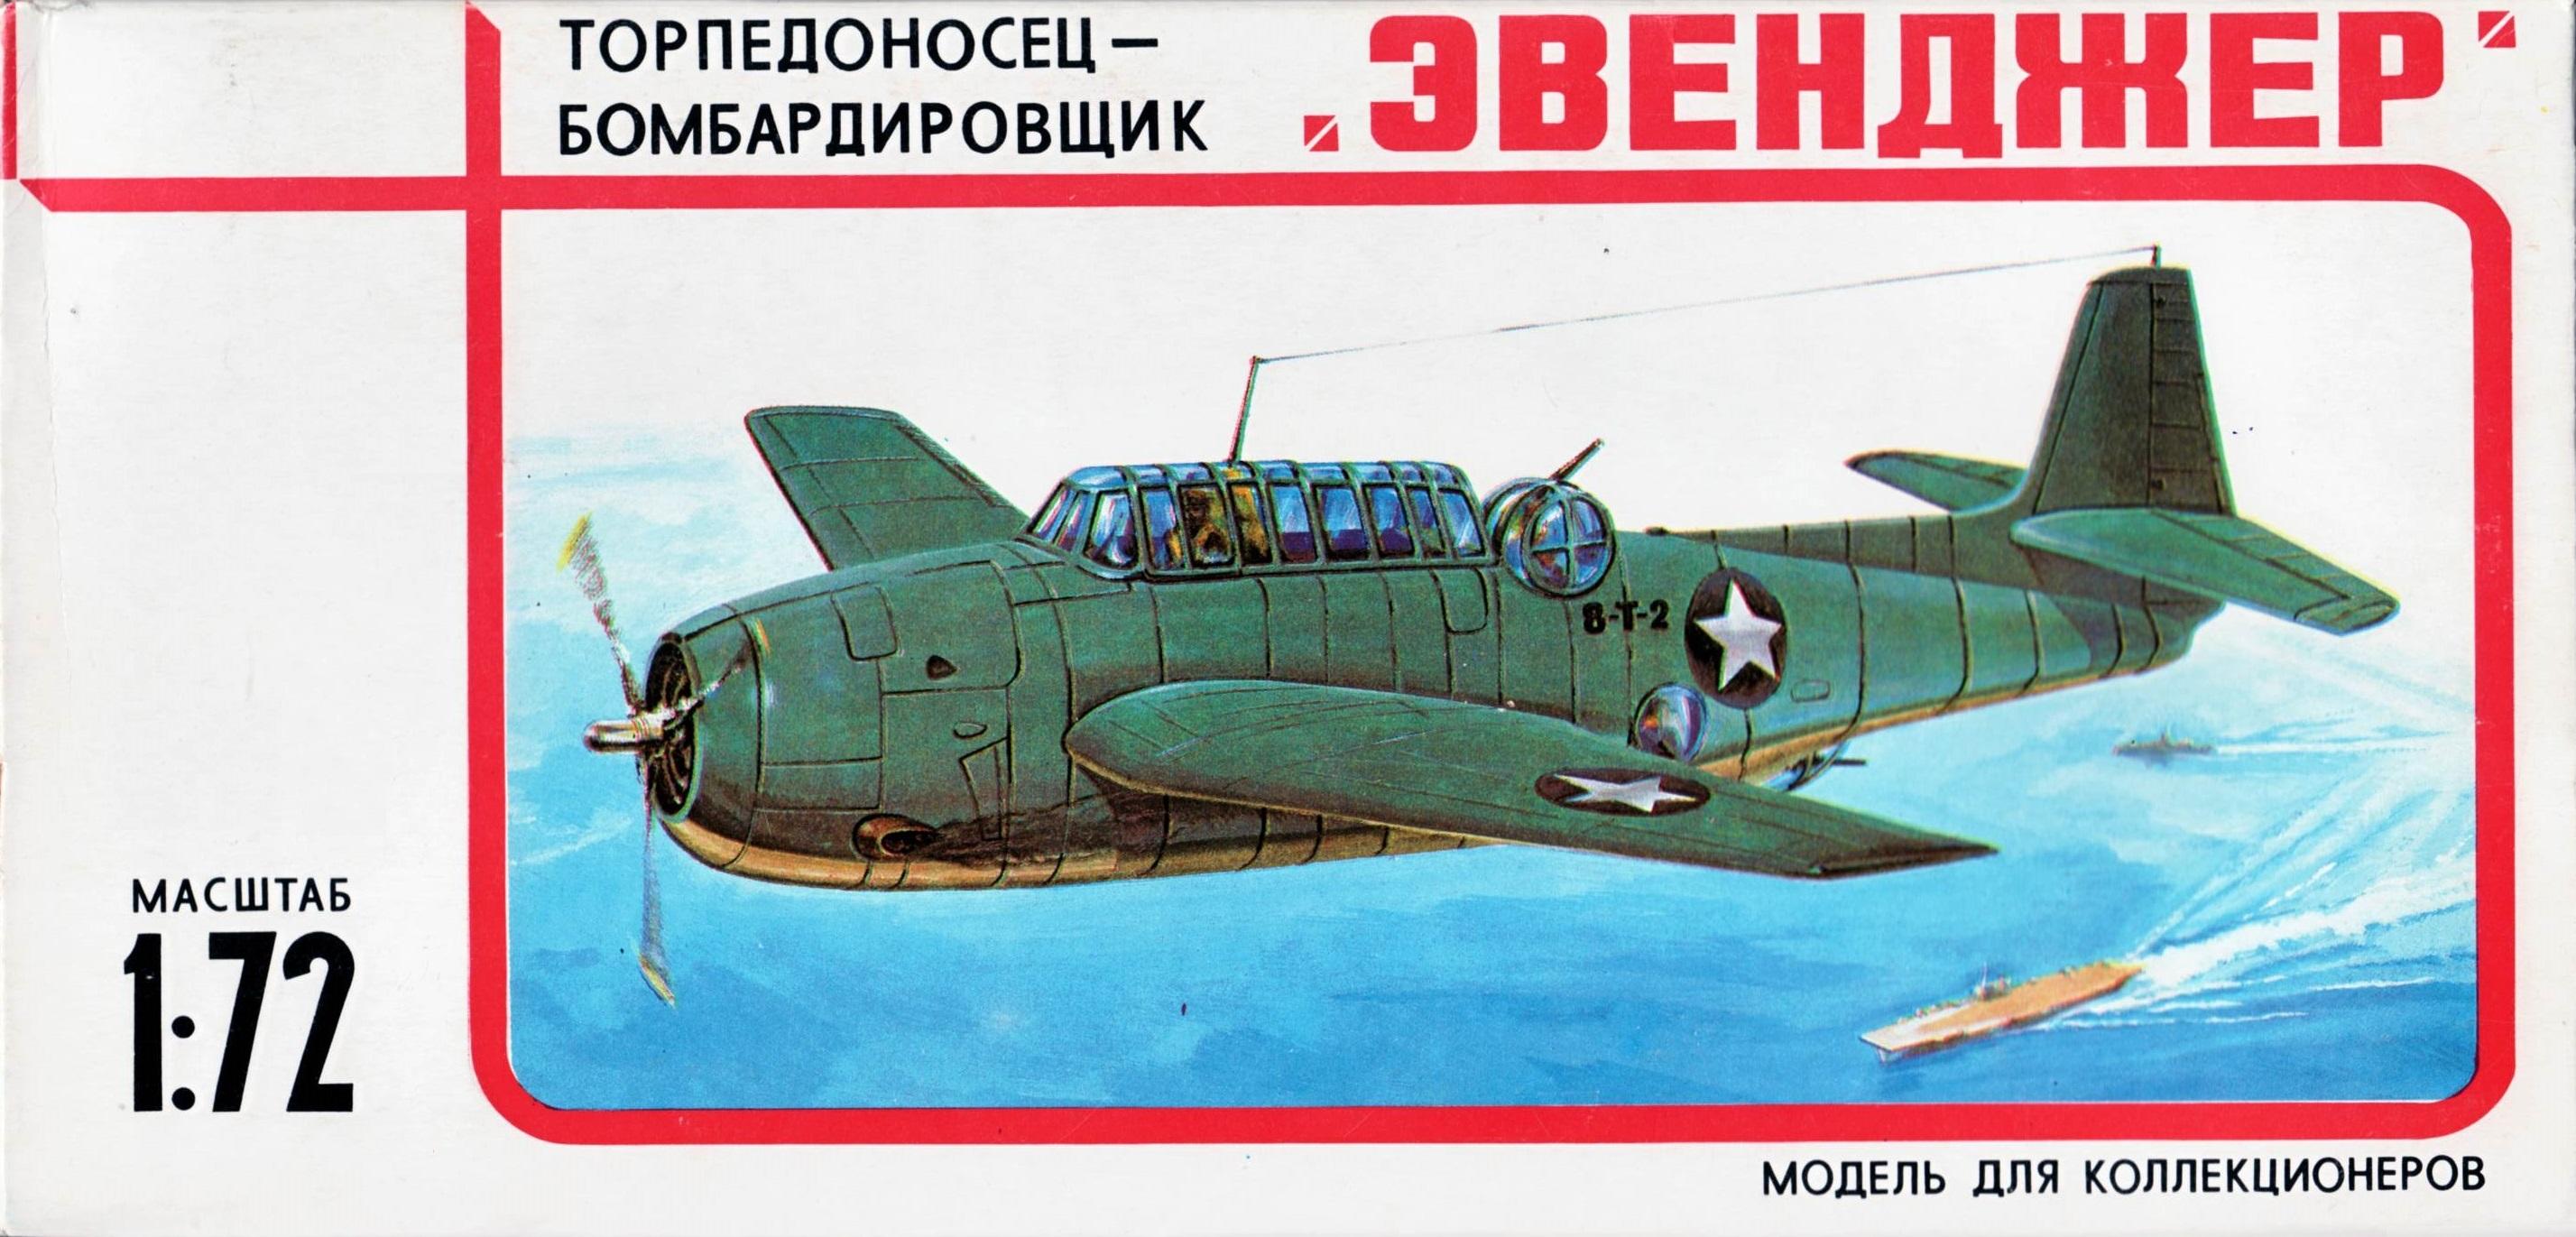 "F244 ""Эвенджер"" производства кооператива МИК"